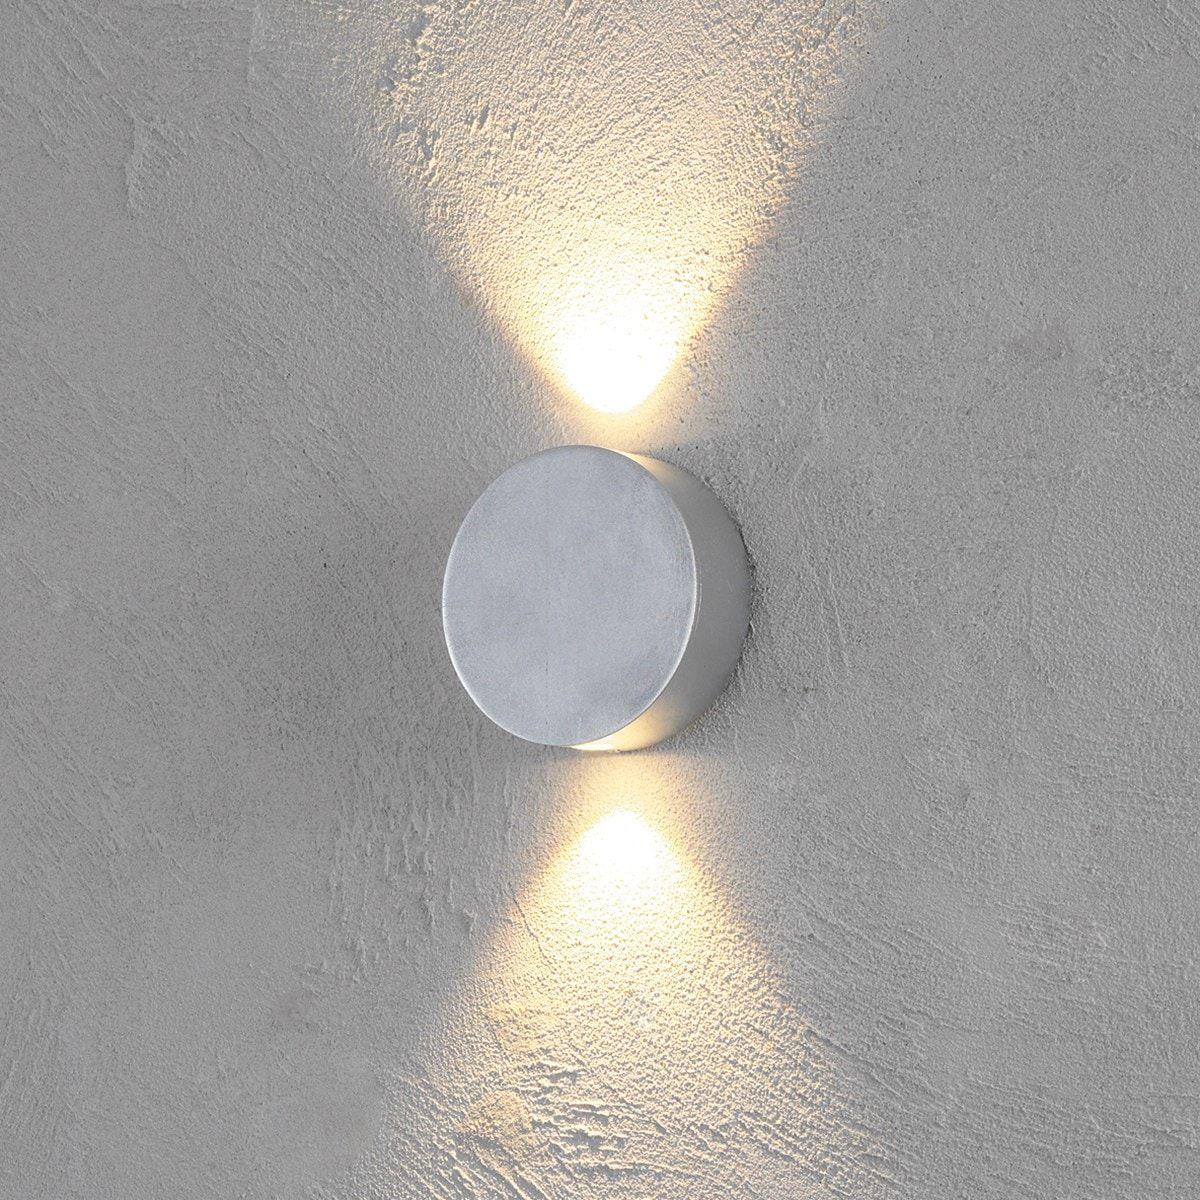 Wandleuchte Innen Batterie Led Lampe Holz Selber Bauen Schlafzimmer Wandleuchte Mit Schalter Wandleuchte Spot Wandleuchte Guns Wandleuchte Lampe Lampen